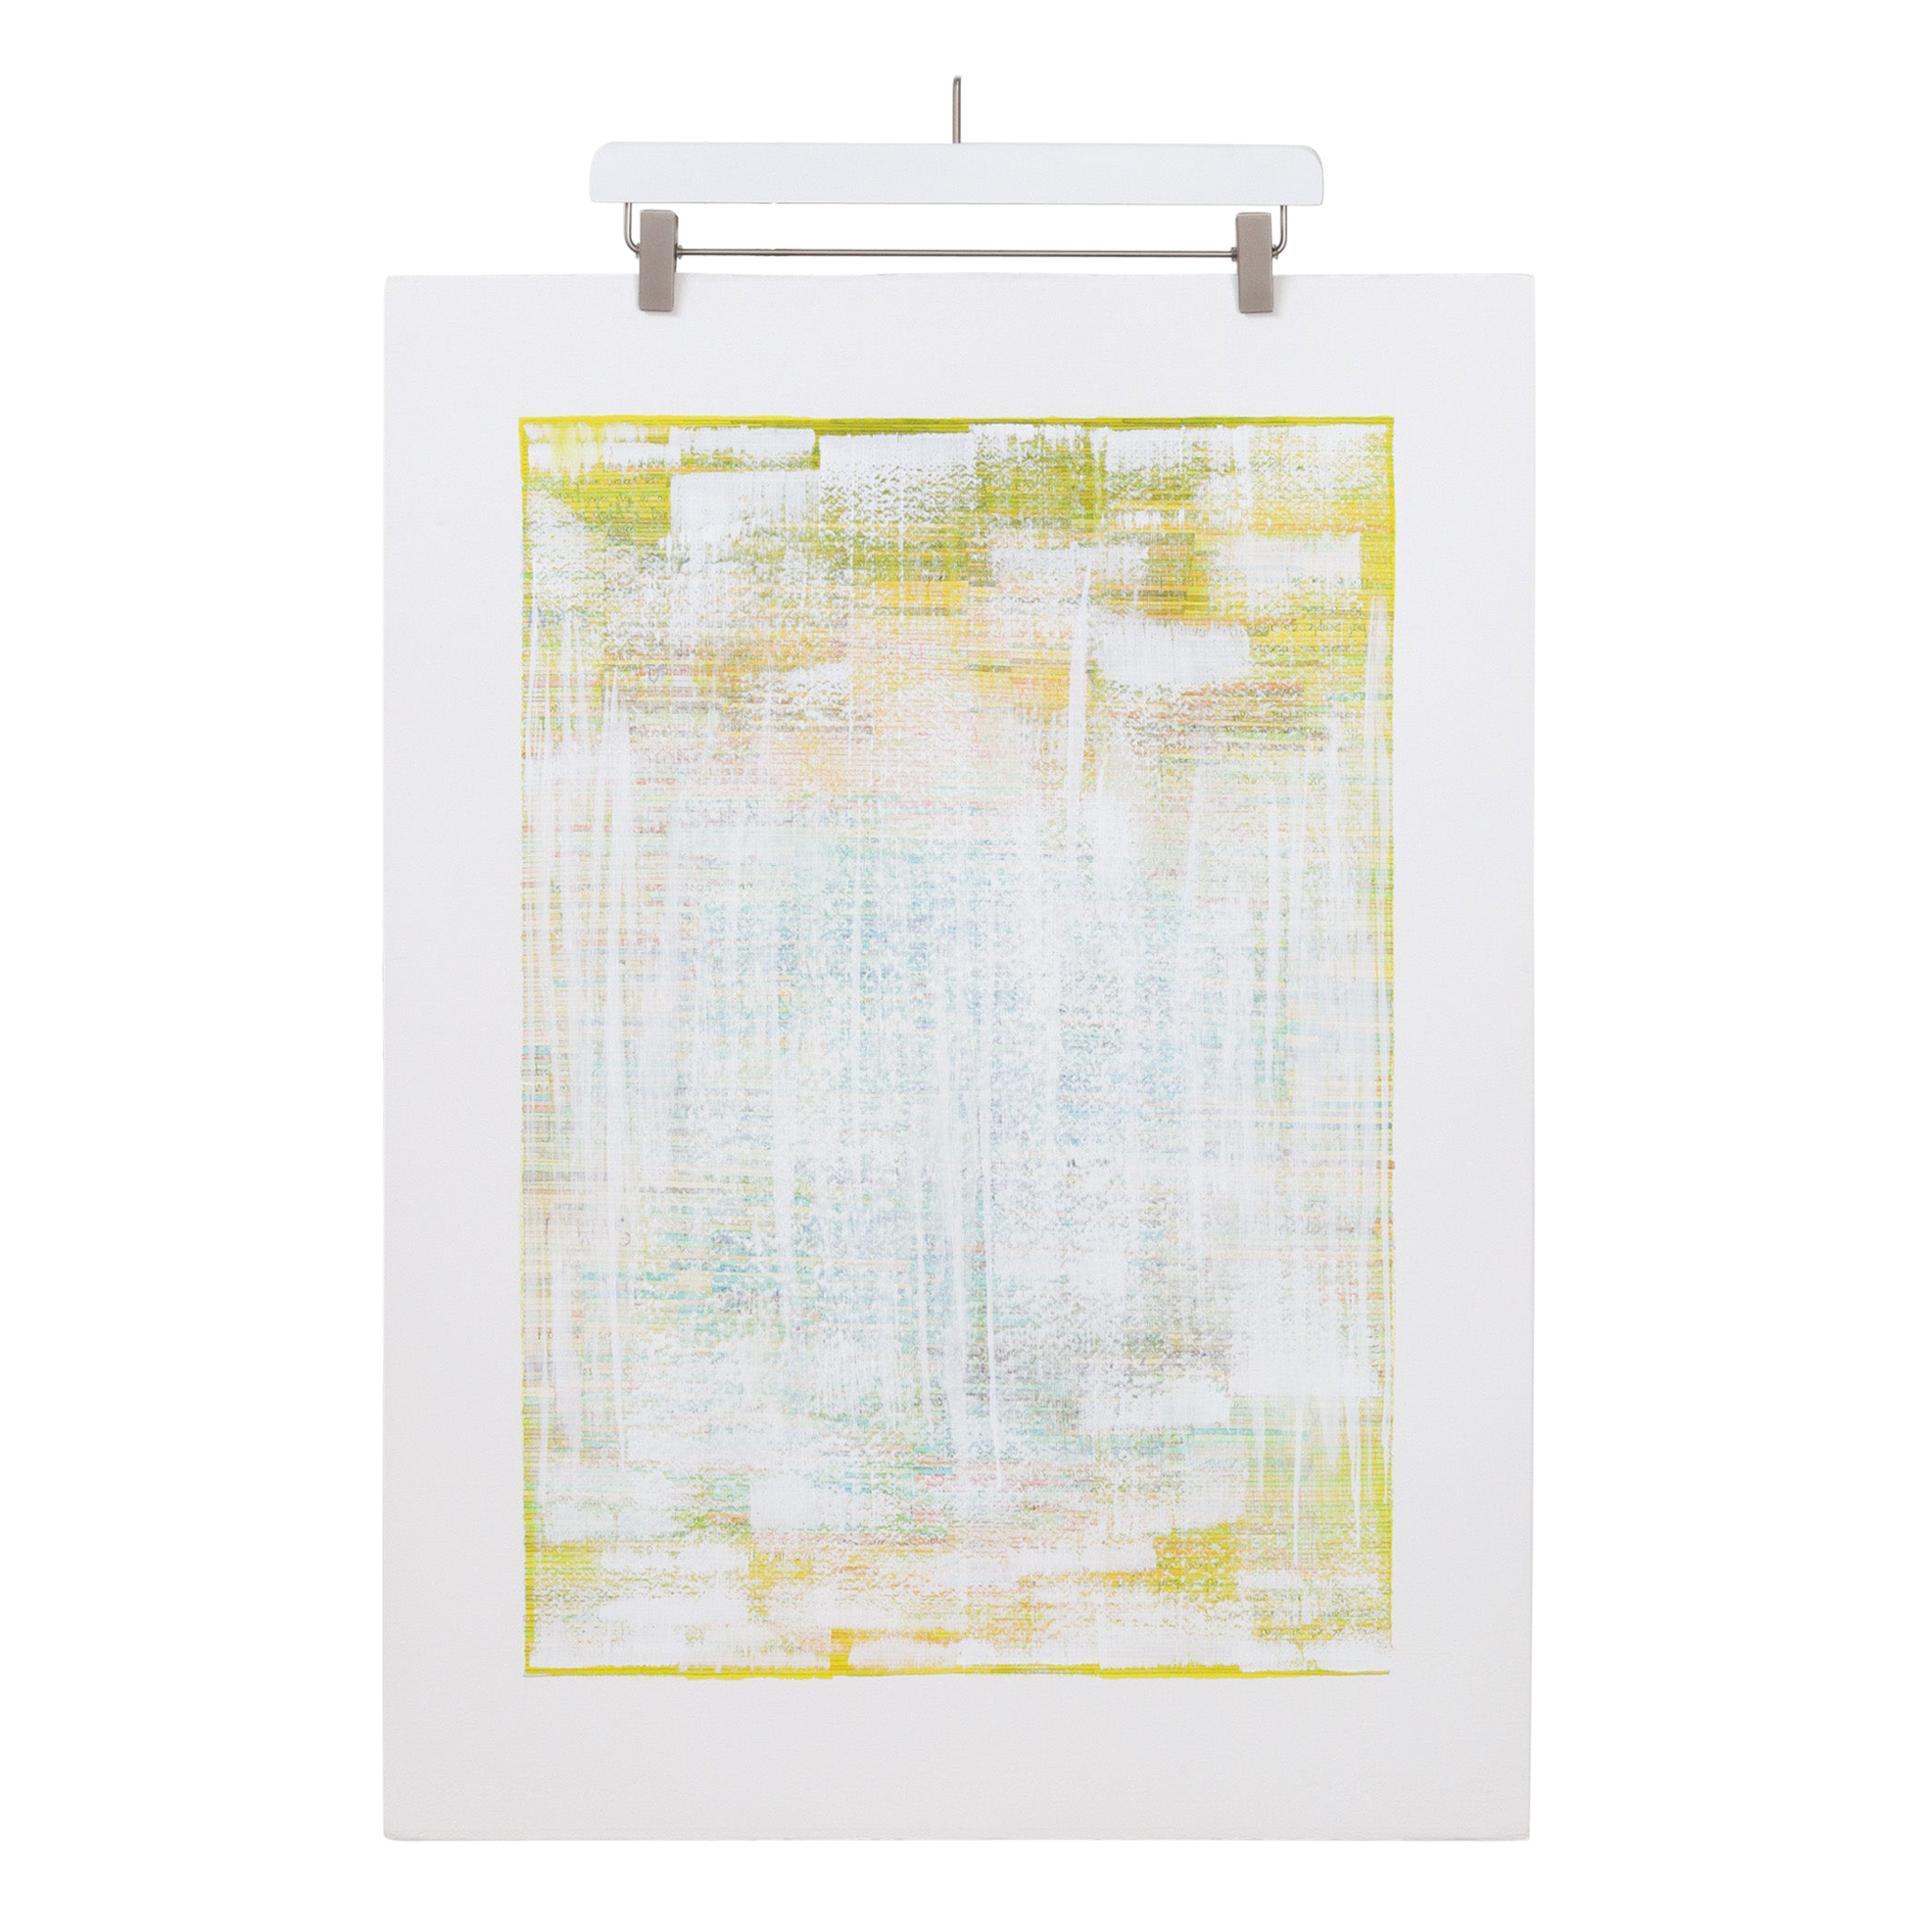 """Eisco Sulfur"", Original Mixed-Media Painting on Paper"